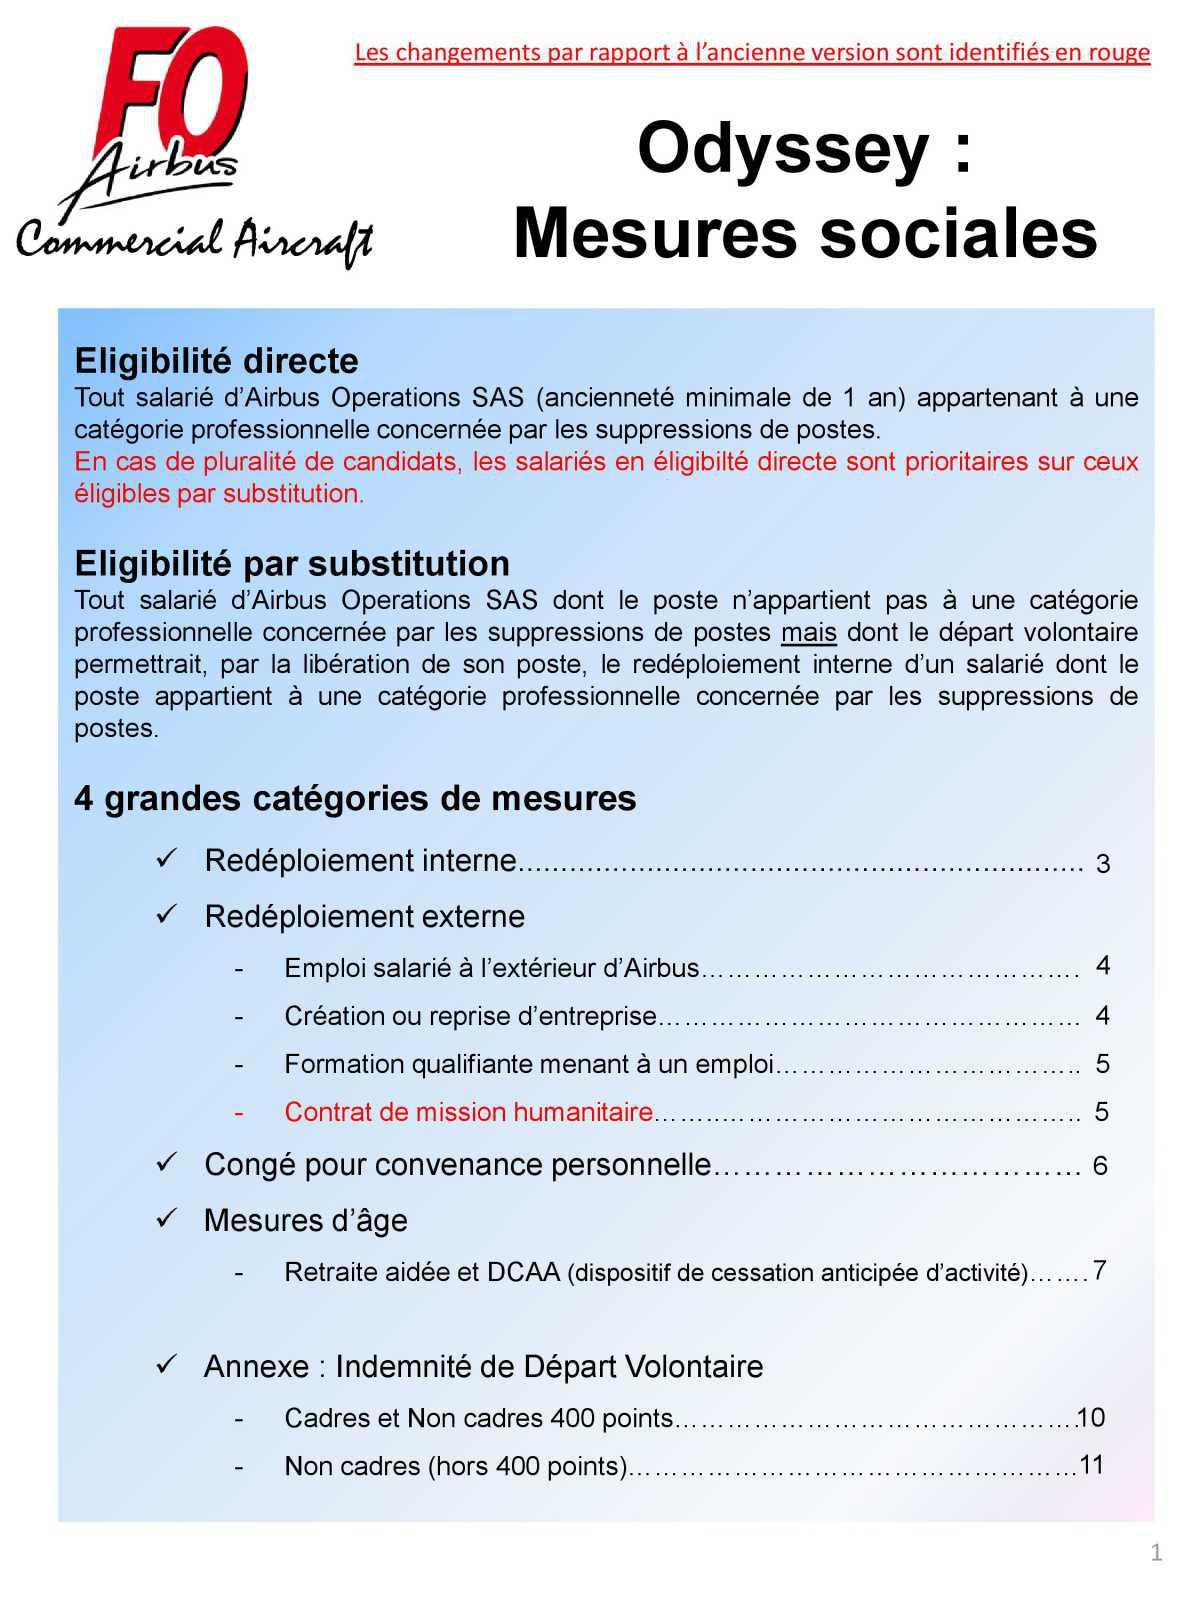 Synthèse sur les mesures sociales ODYSSEY